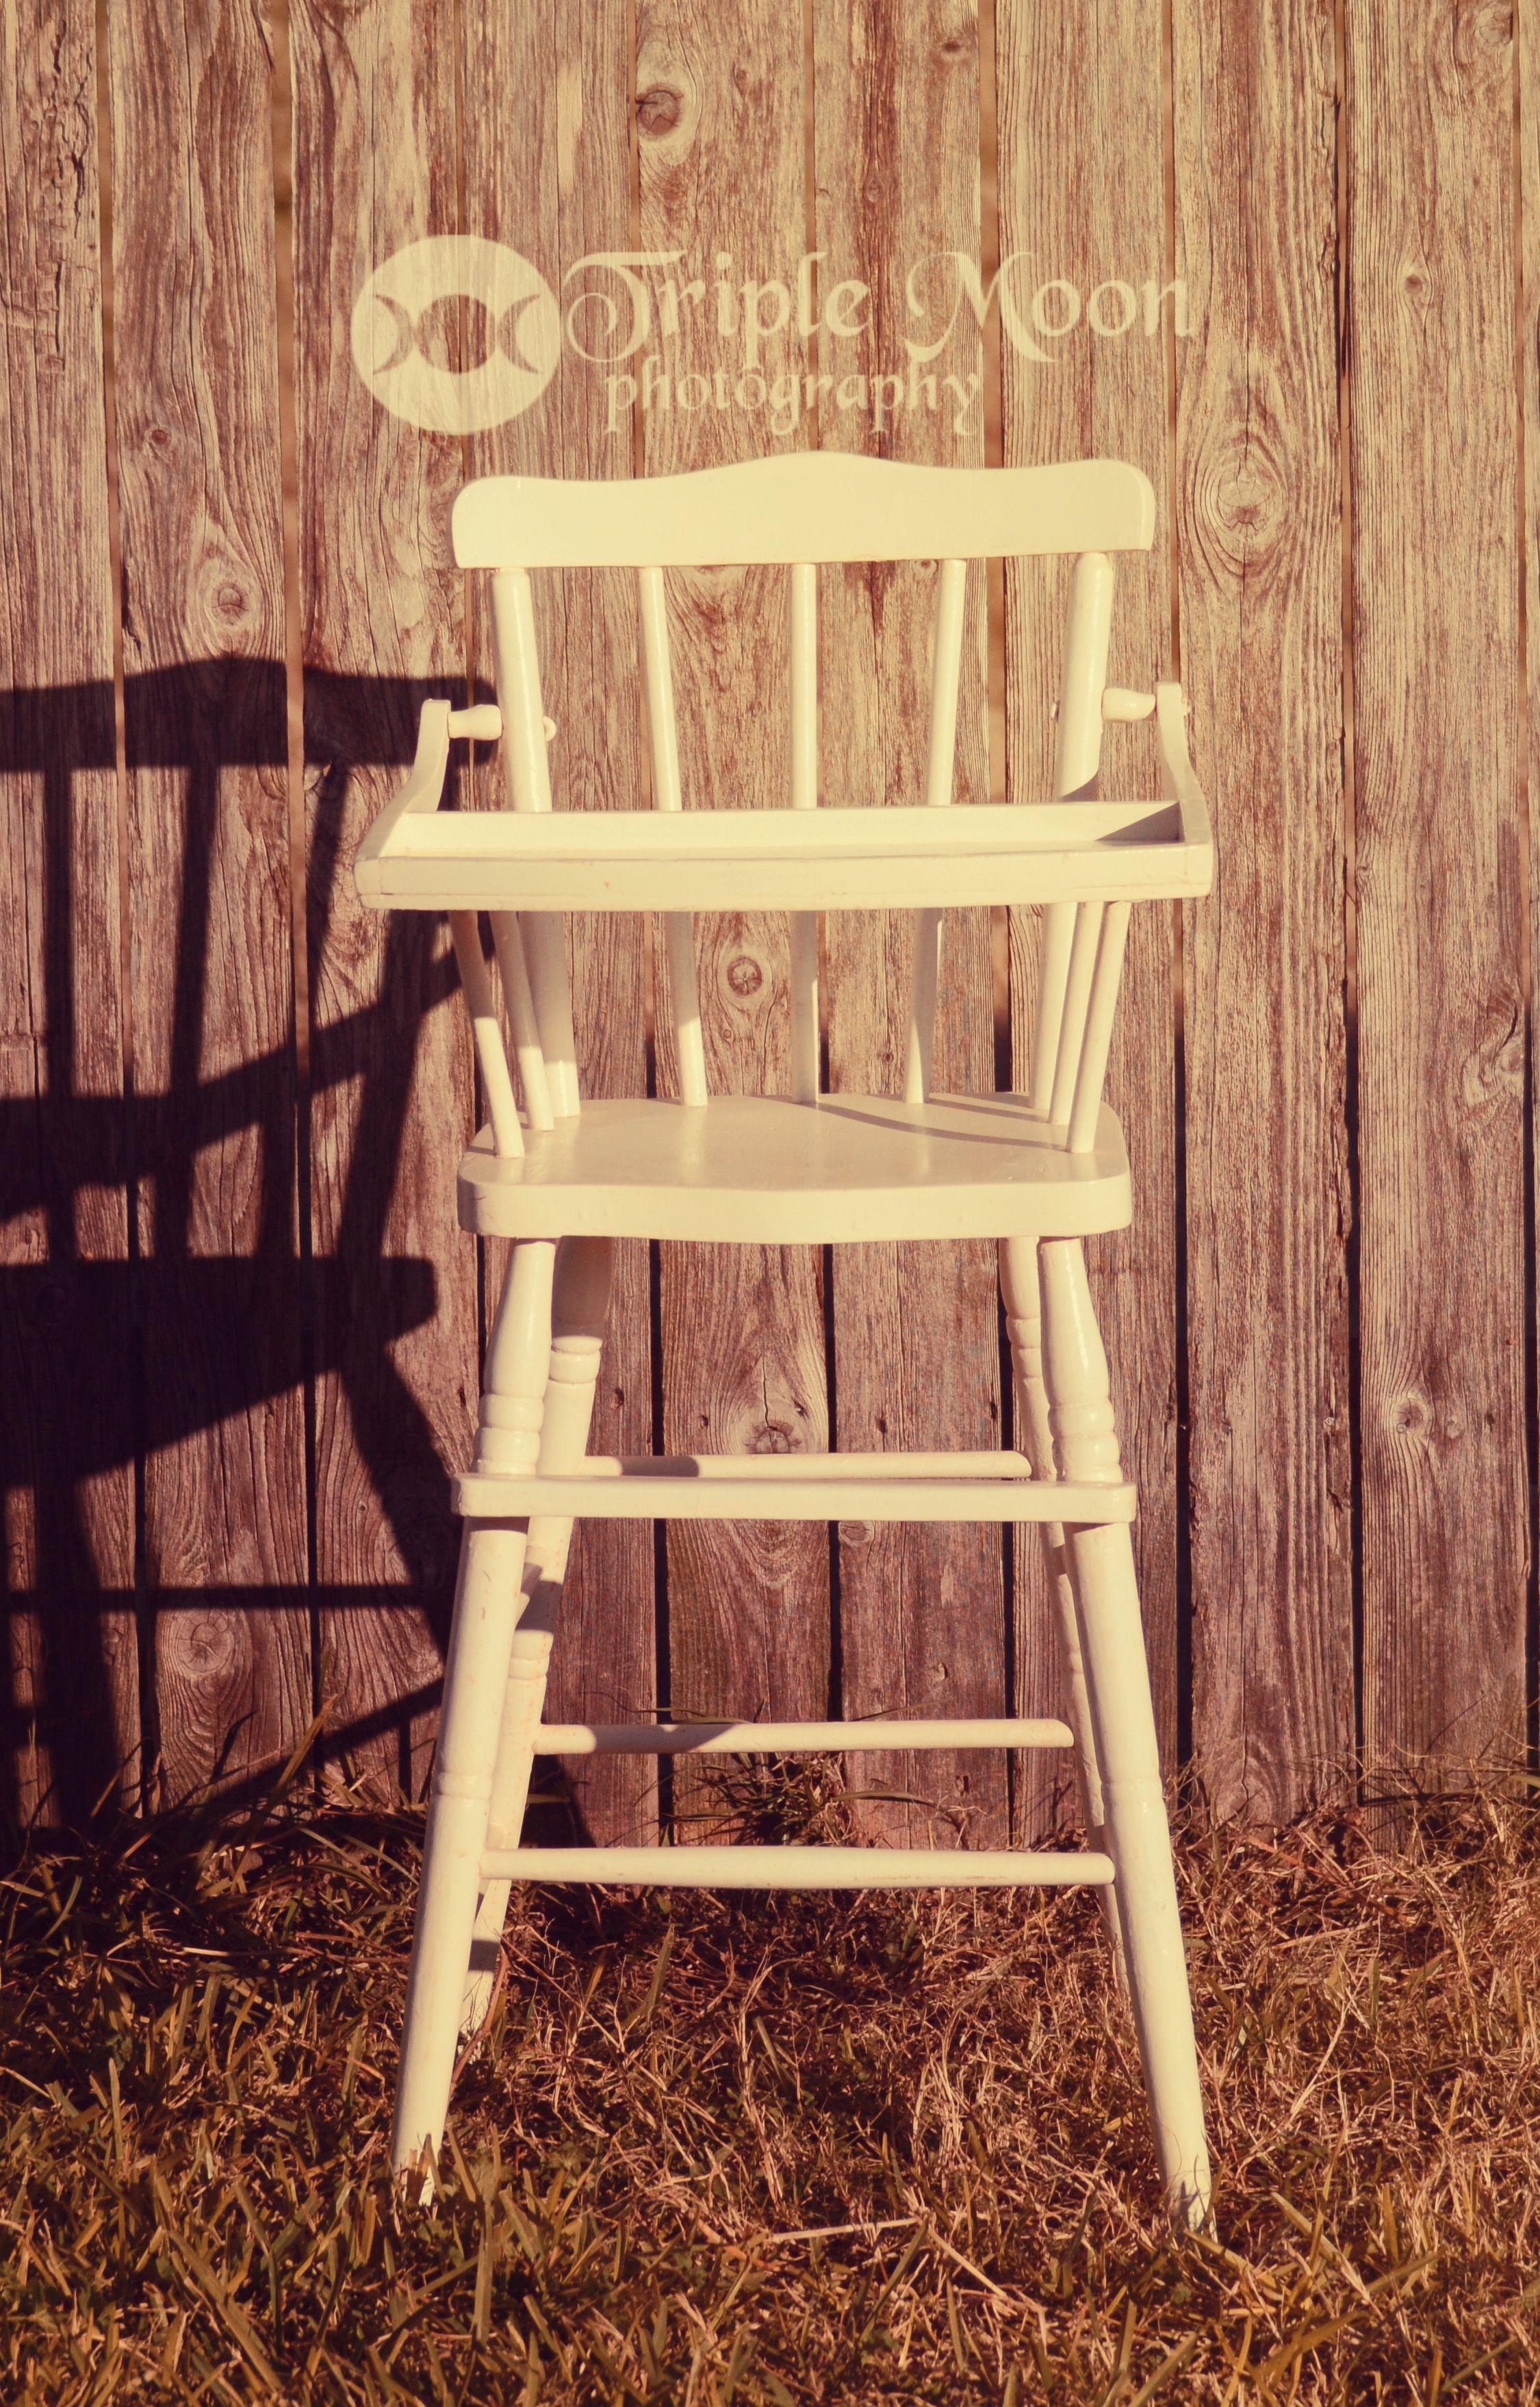 Vintage High Chair | Vintage High Chairs | Pinterest | Vintage high ...